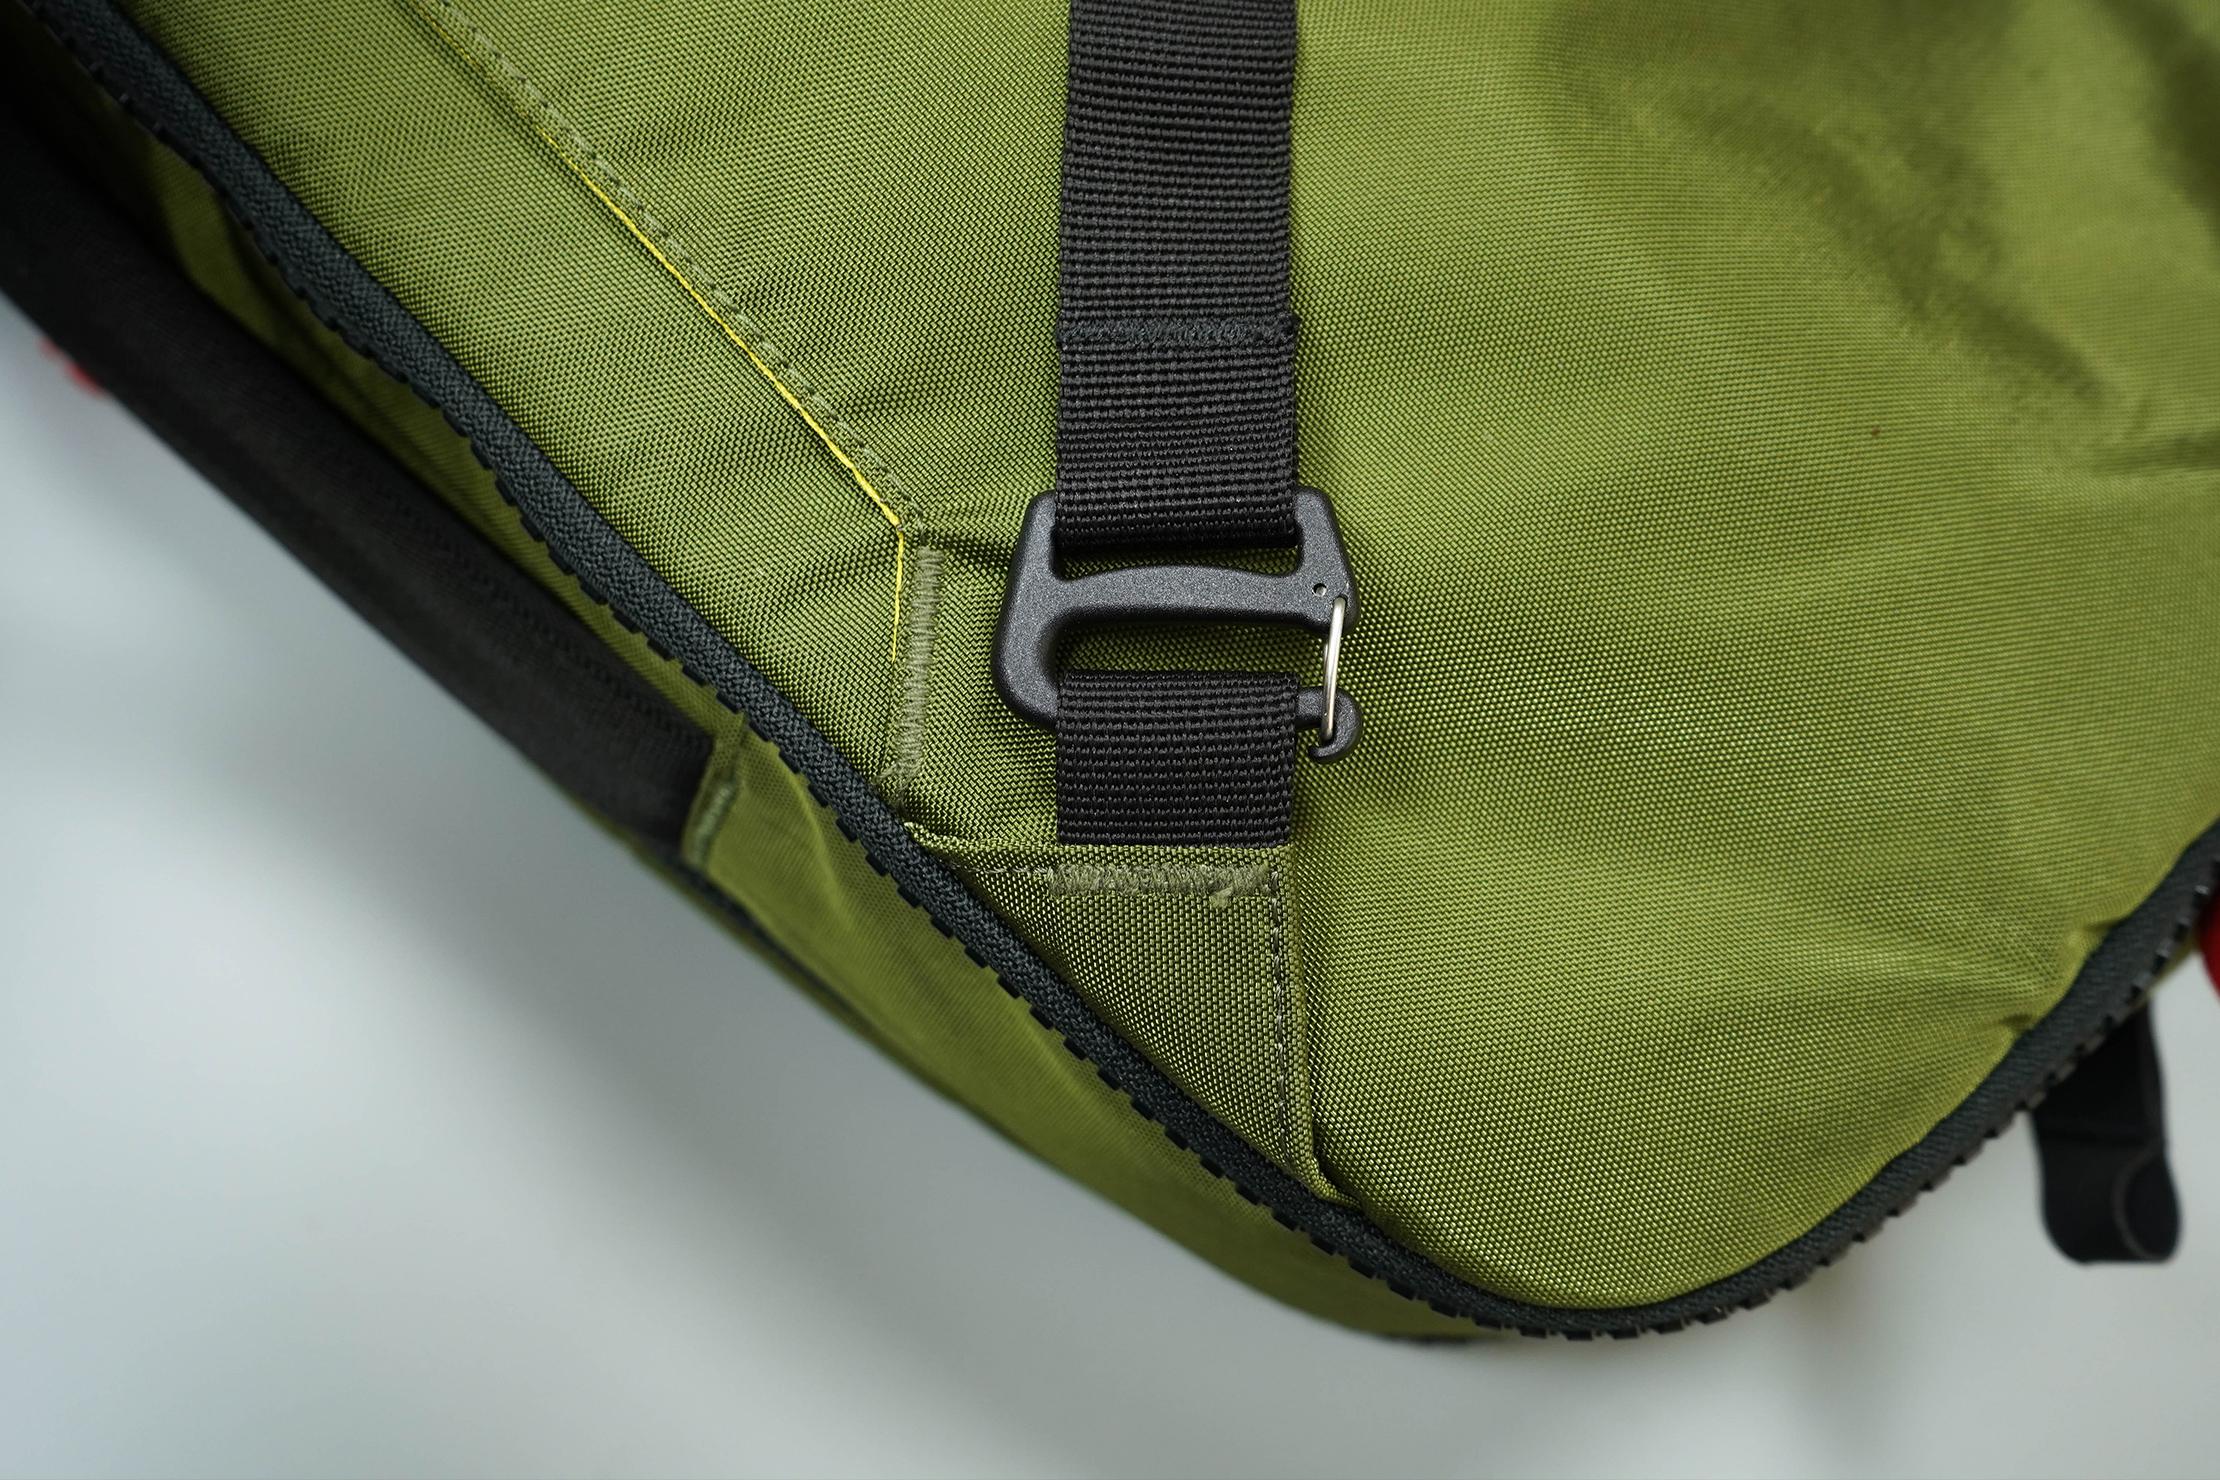 Topo Designs Global Briefcase 3-Day Gatekeeper